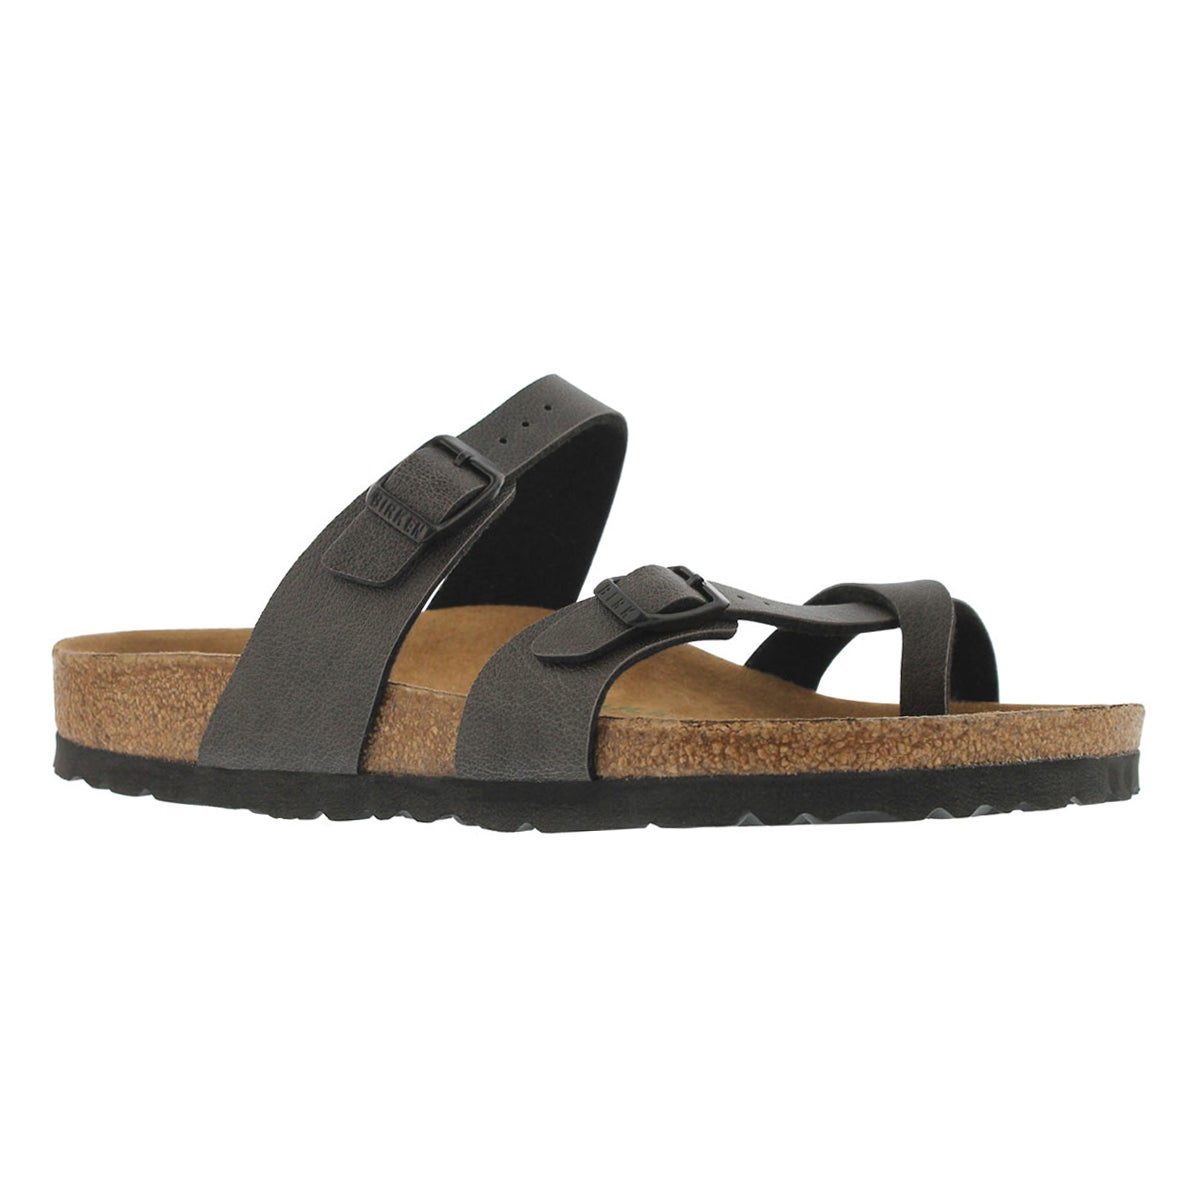 Women's MAYARI VEG BF pullup anthracite sandals